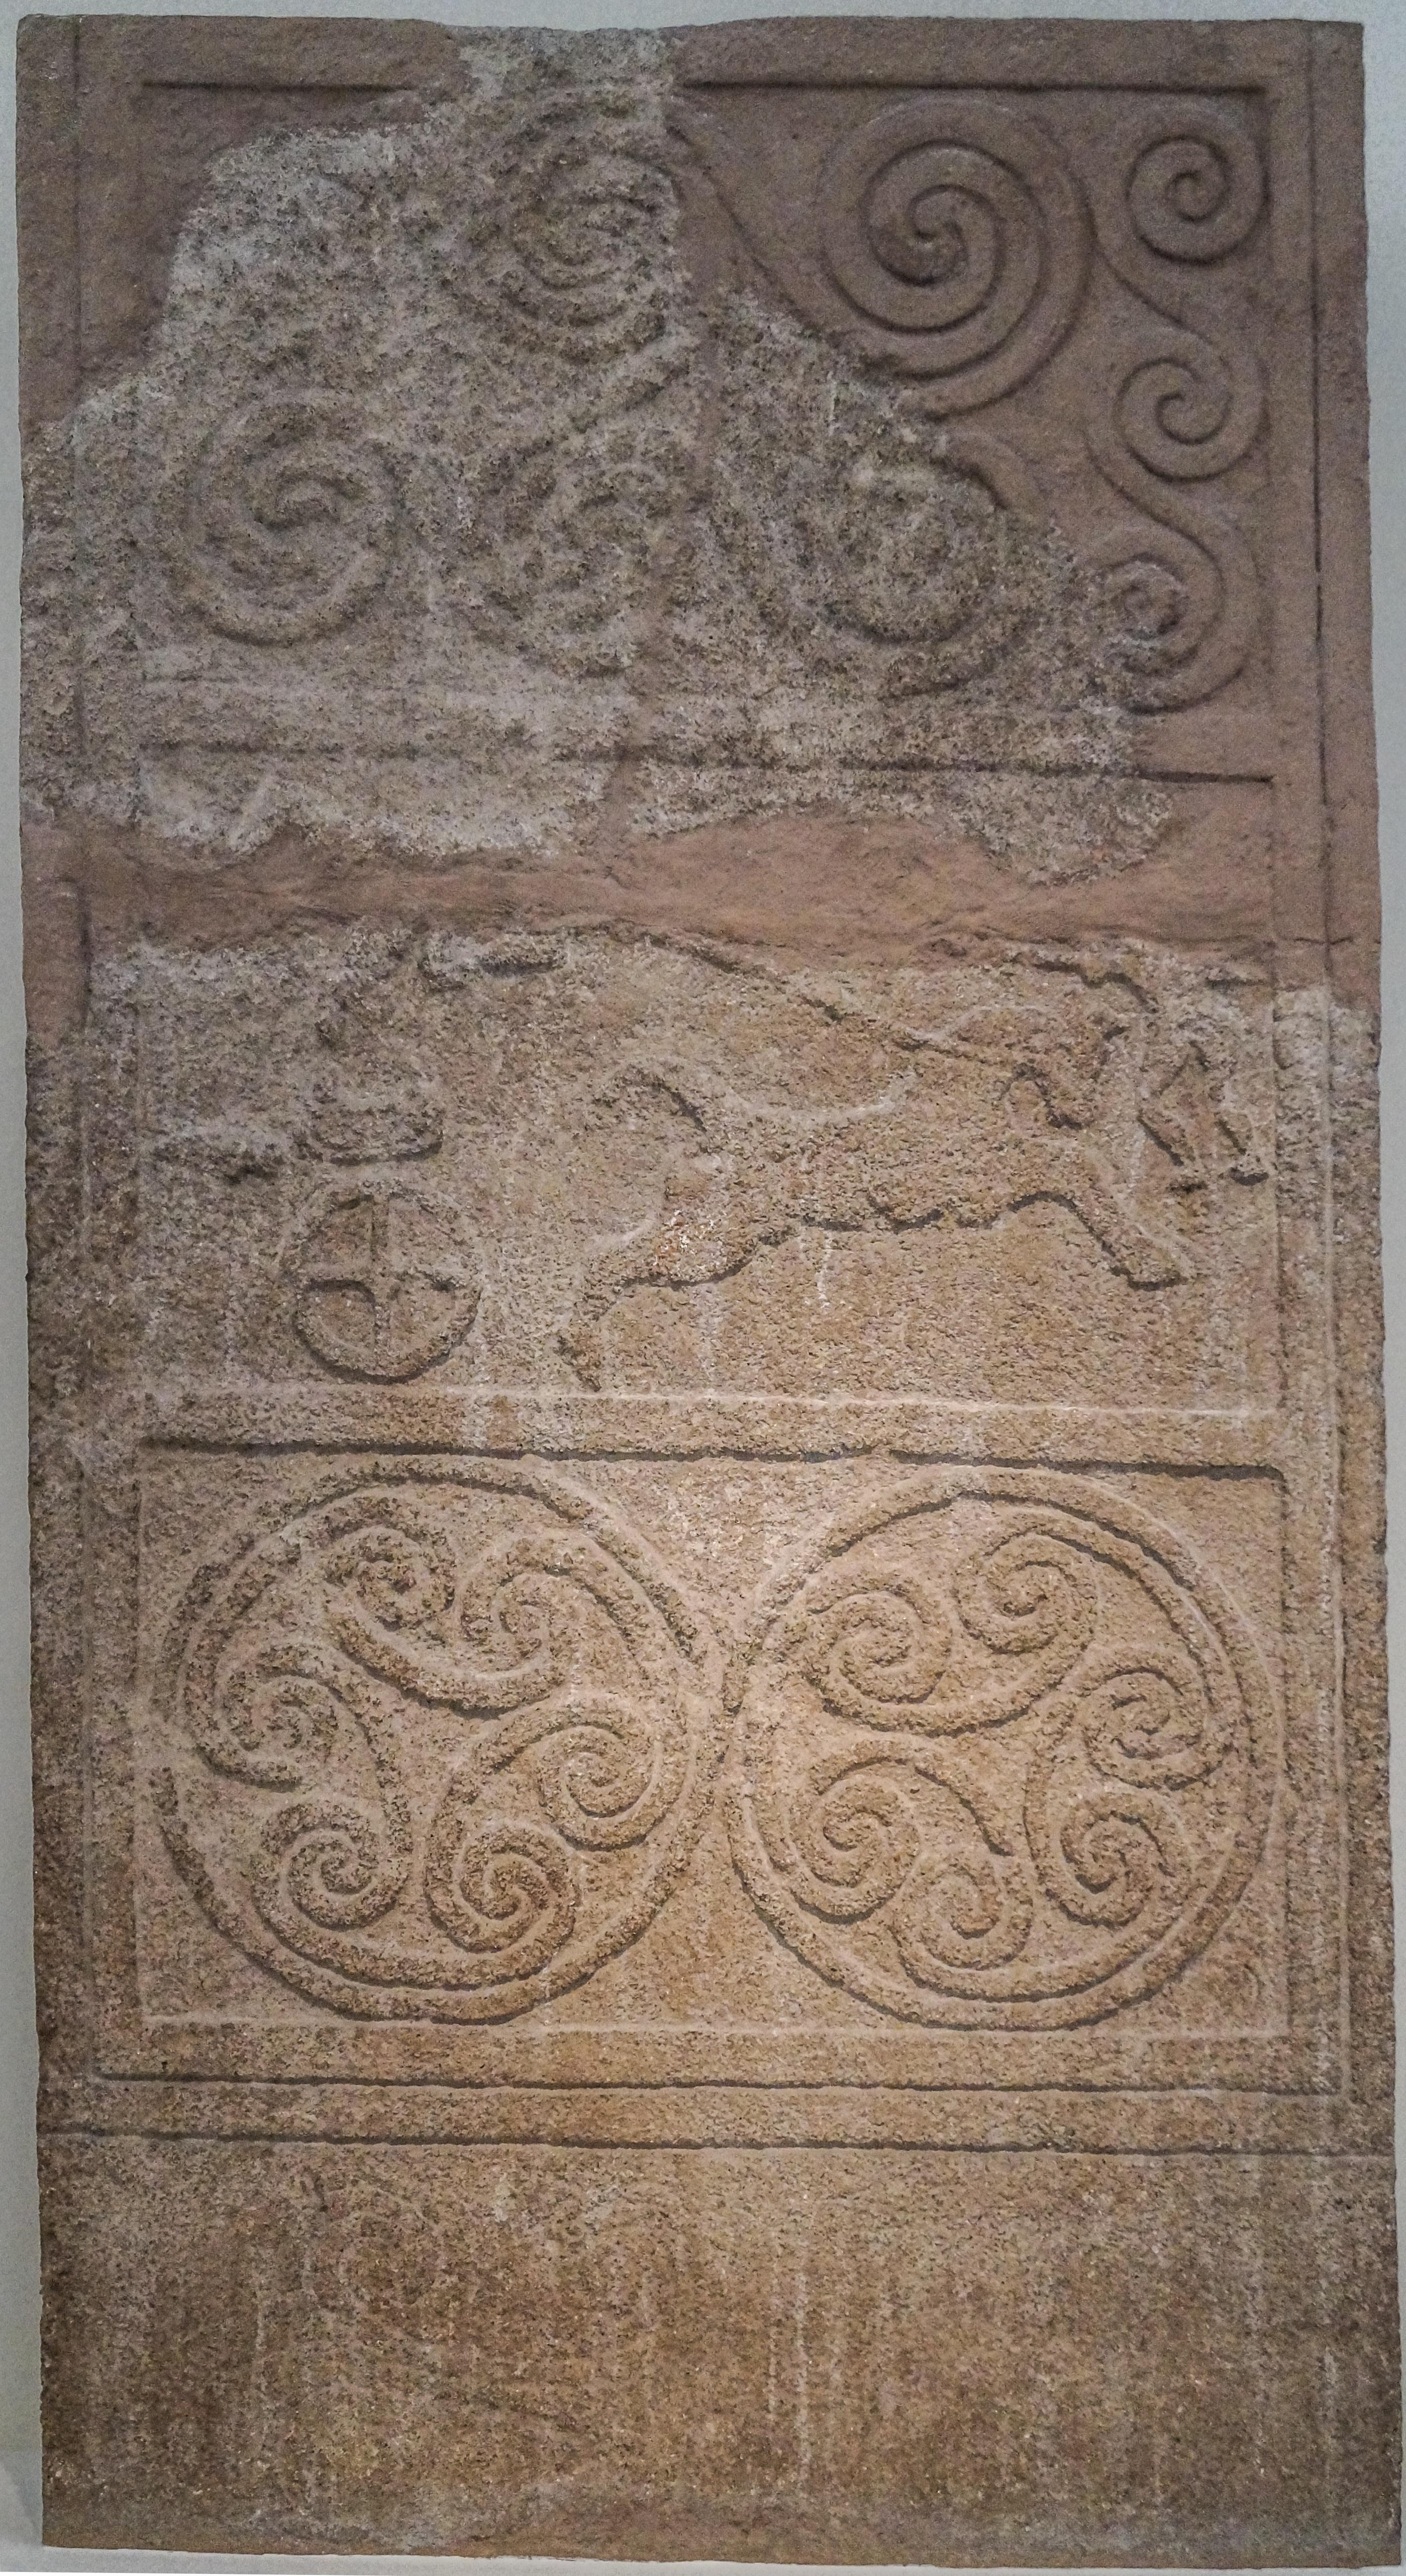 https://upload.wikimedia.org/wikipedia/commons/6/63/Stele_of_Grave_Circle_A_Mycenae_NAMA_1429.jpg